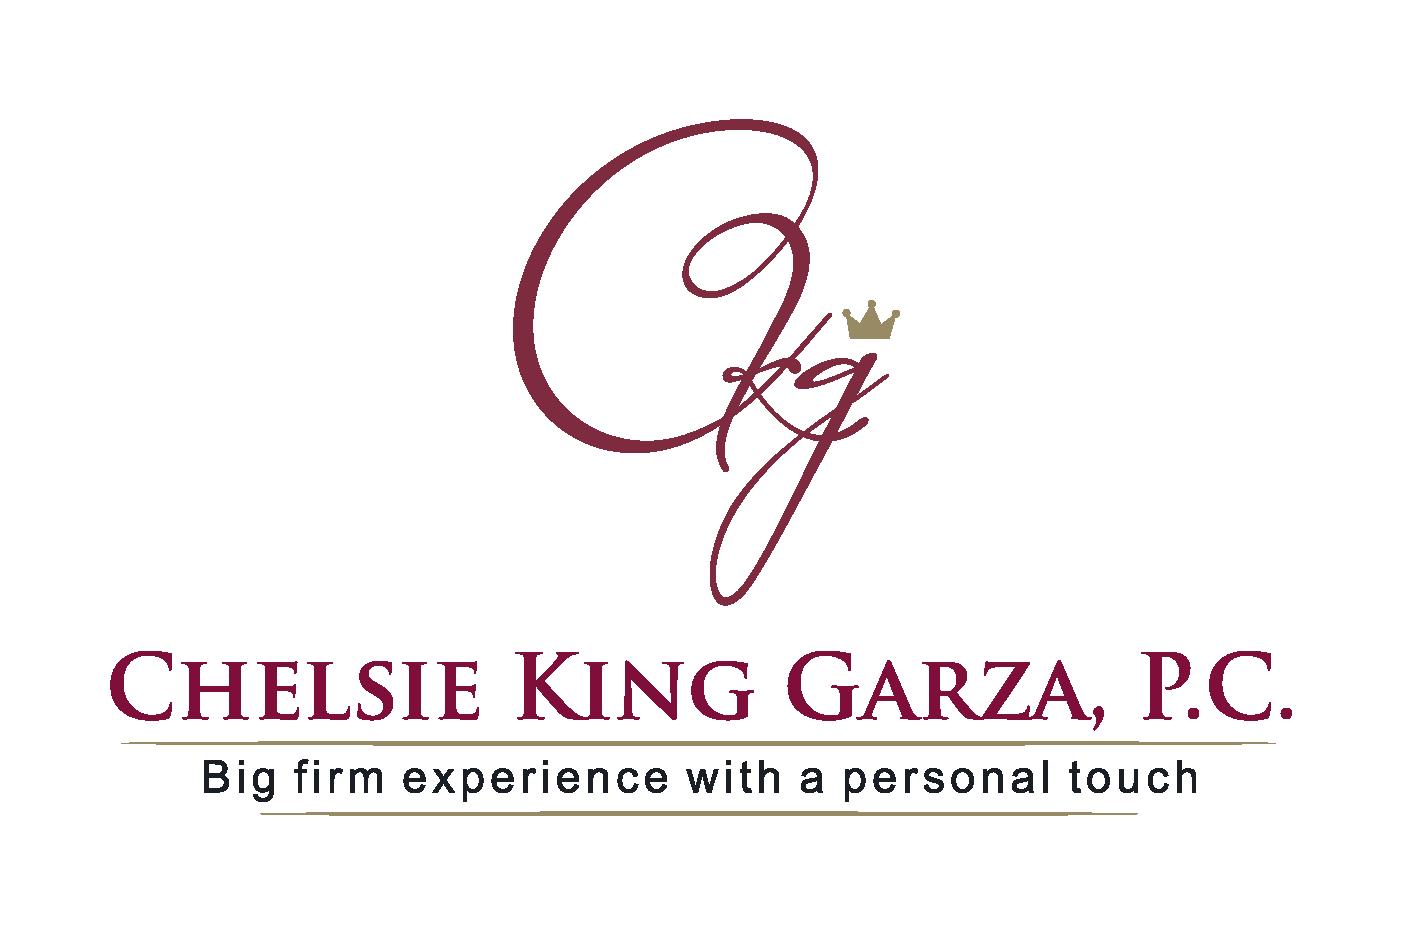 Chelsie King Garza